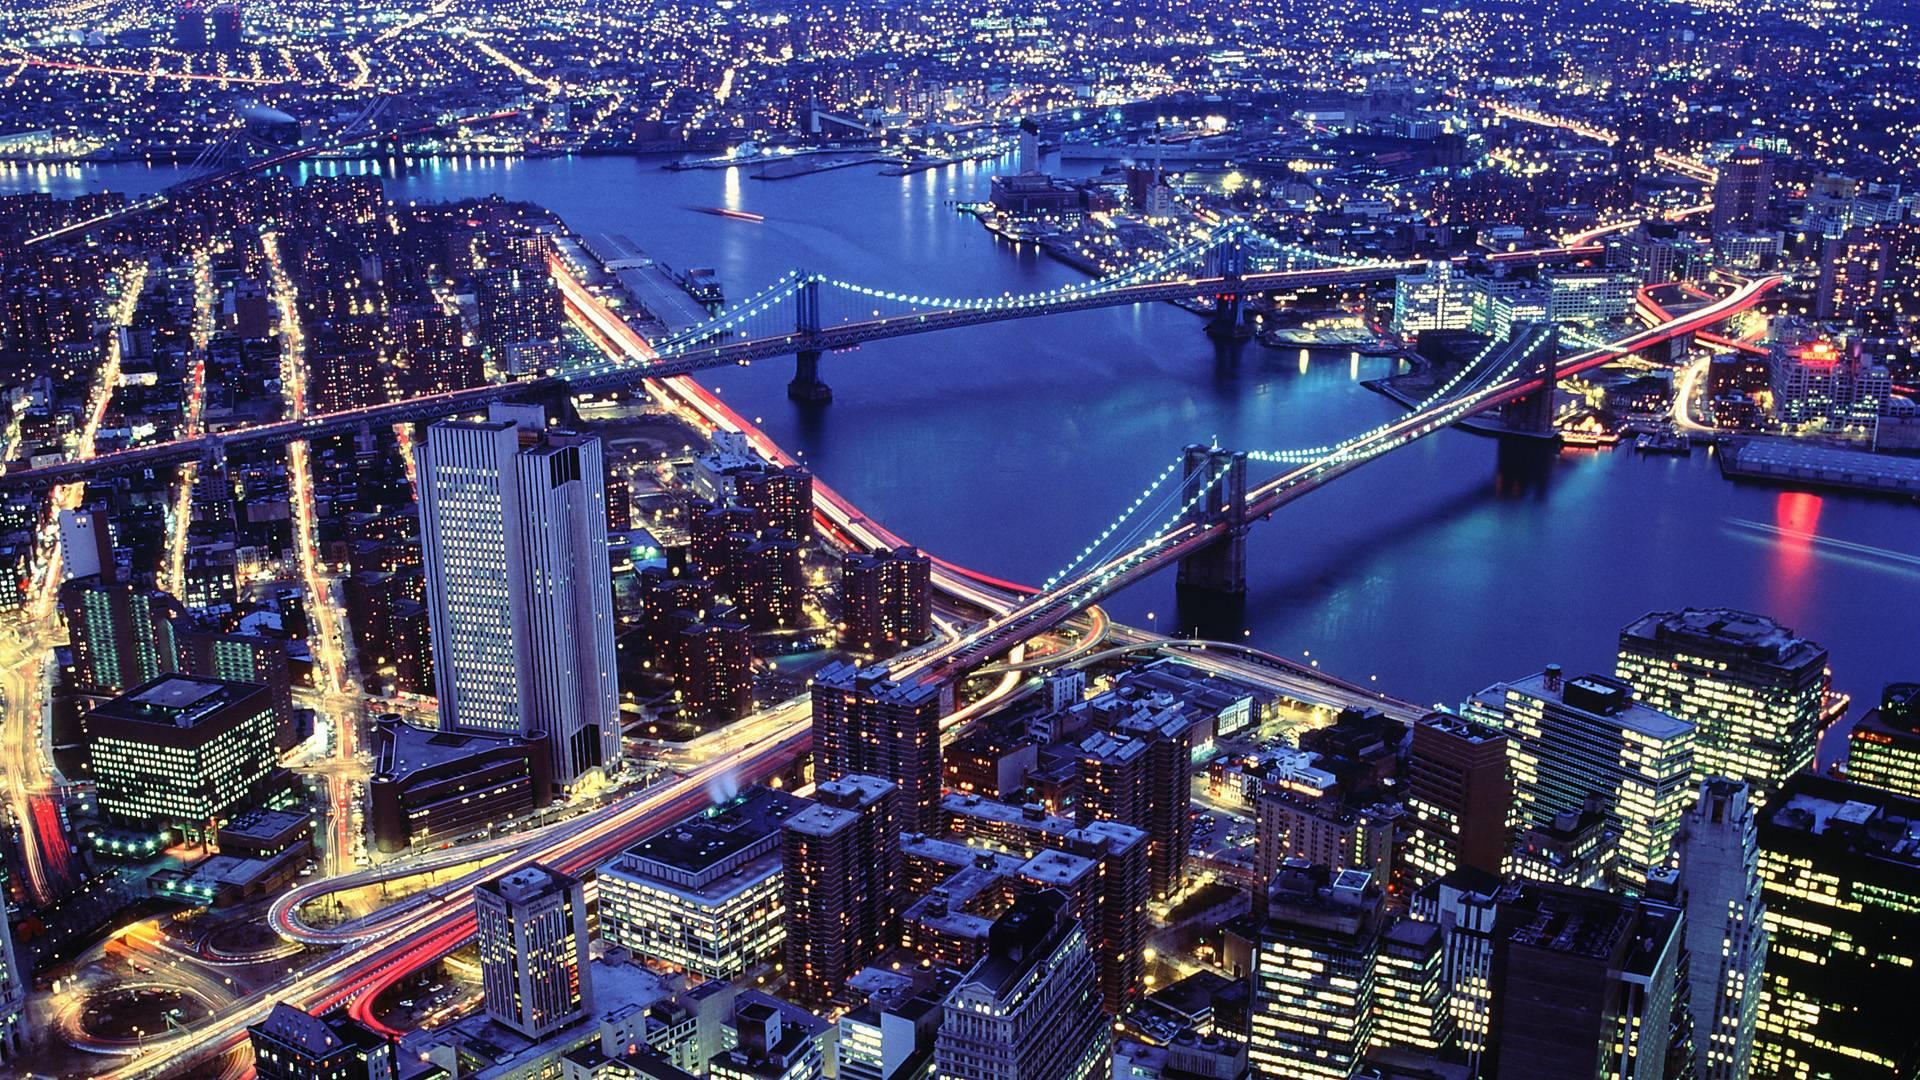 New york city image wallpapers wallpaper cave for Sfondi new york hd